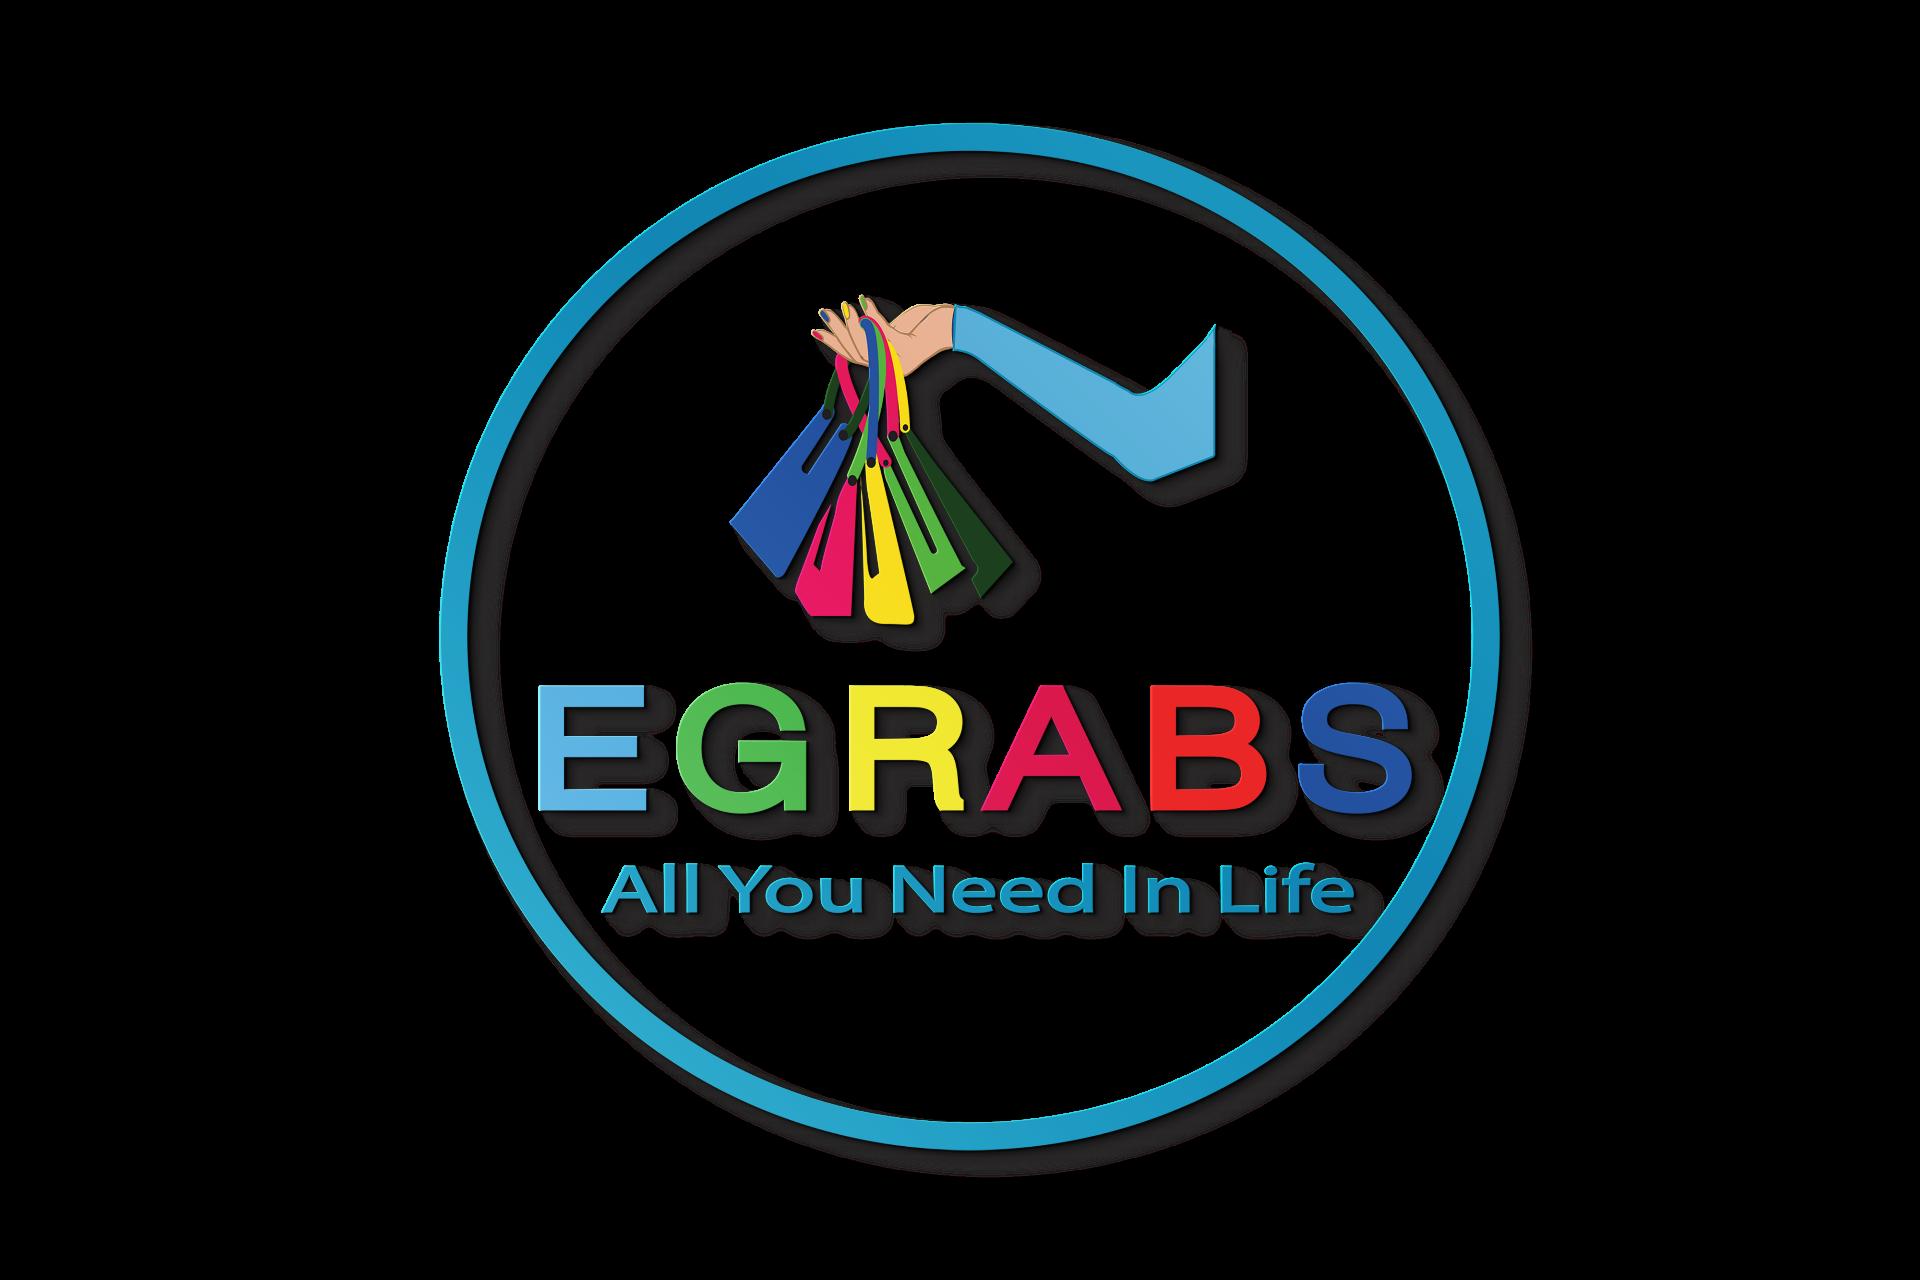 Egrabs